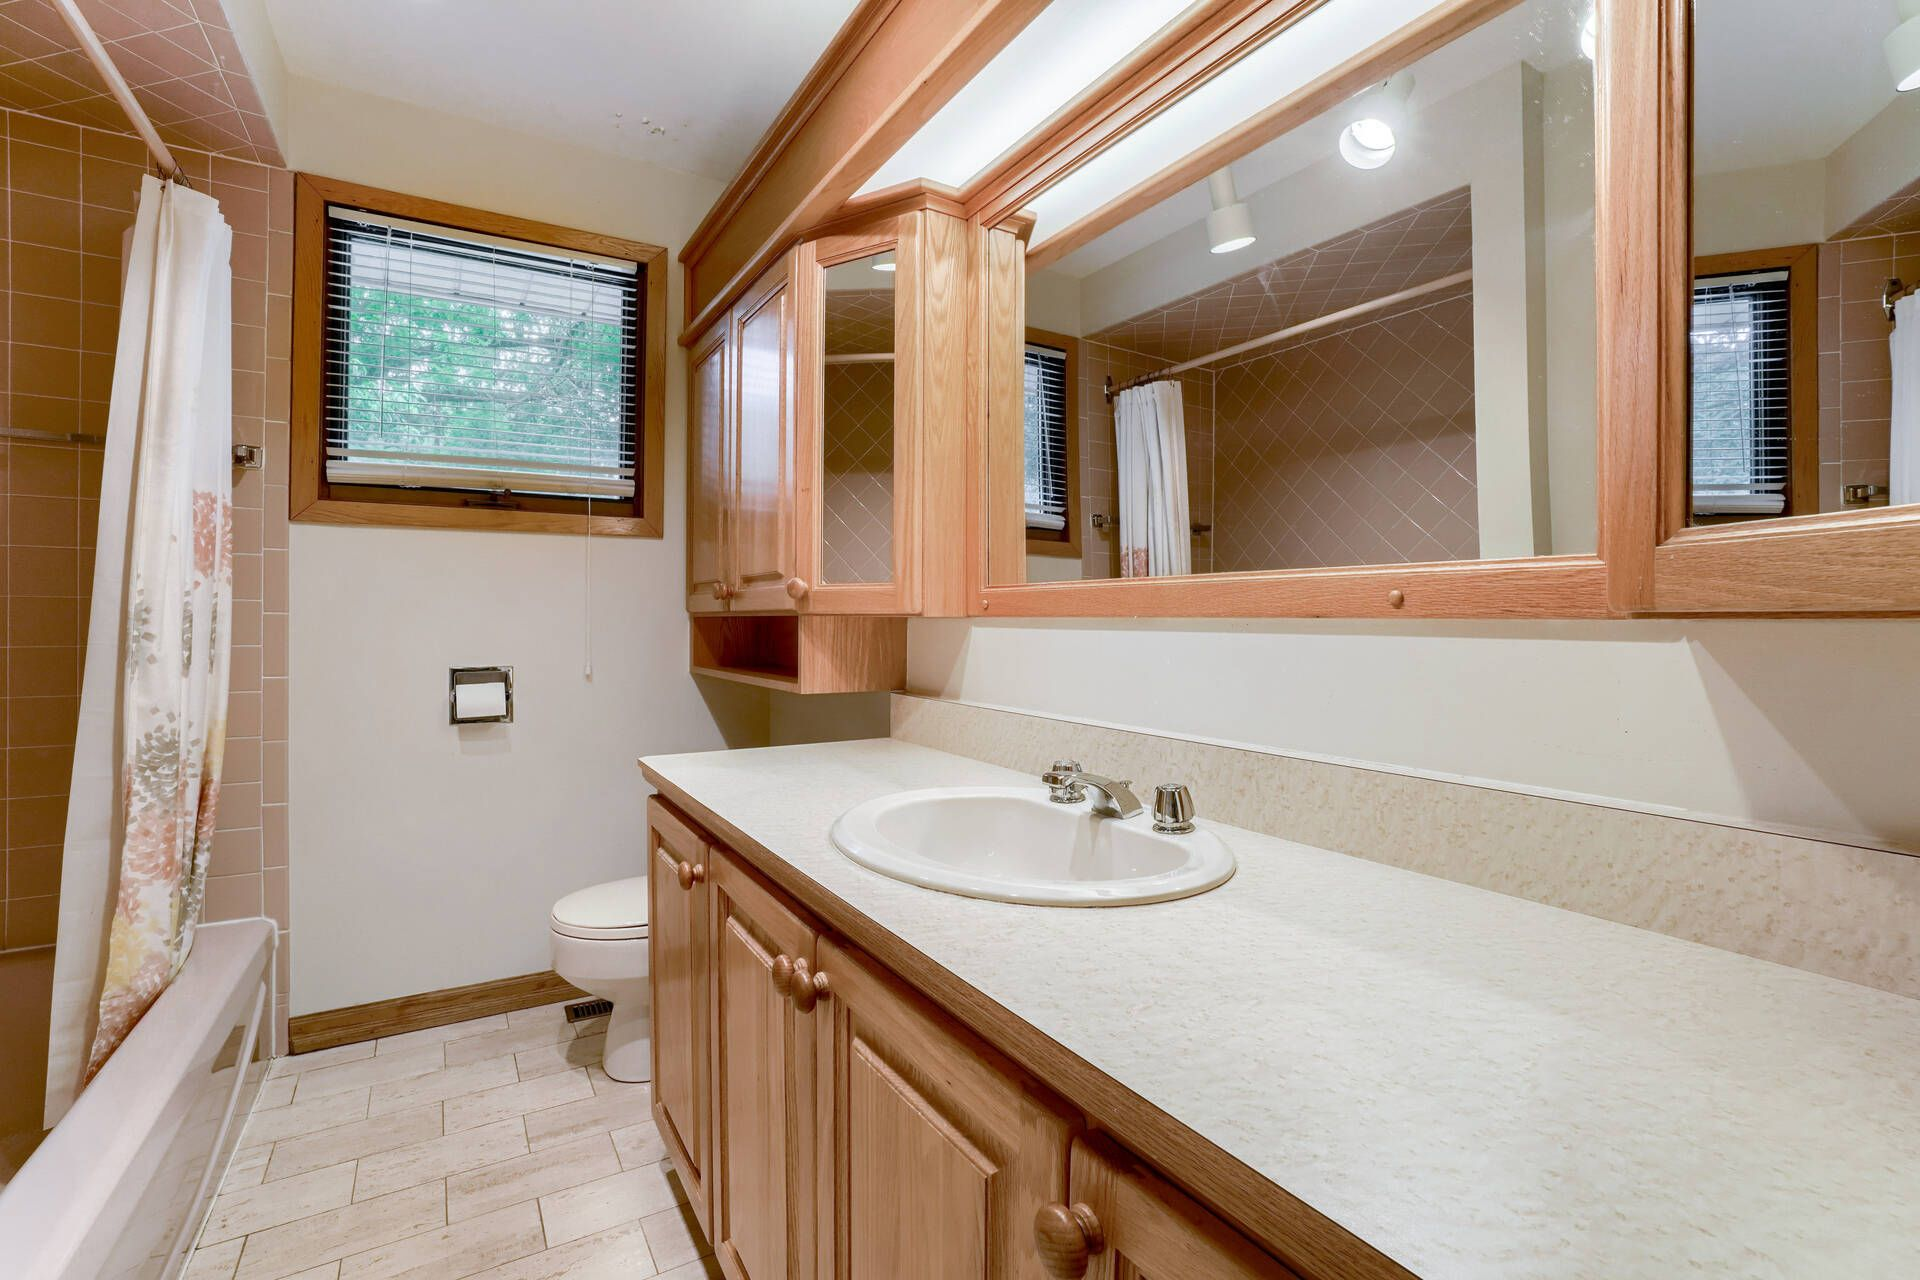 Main Bathroom - 169 Wedgewood Dr, Oakville - Elite3 & Team at 169 Wedgewood Drive, Eastlake, Oakville